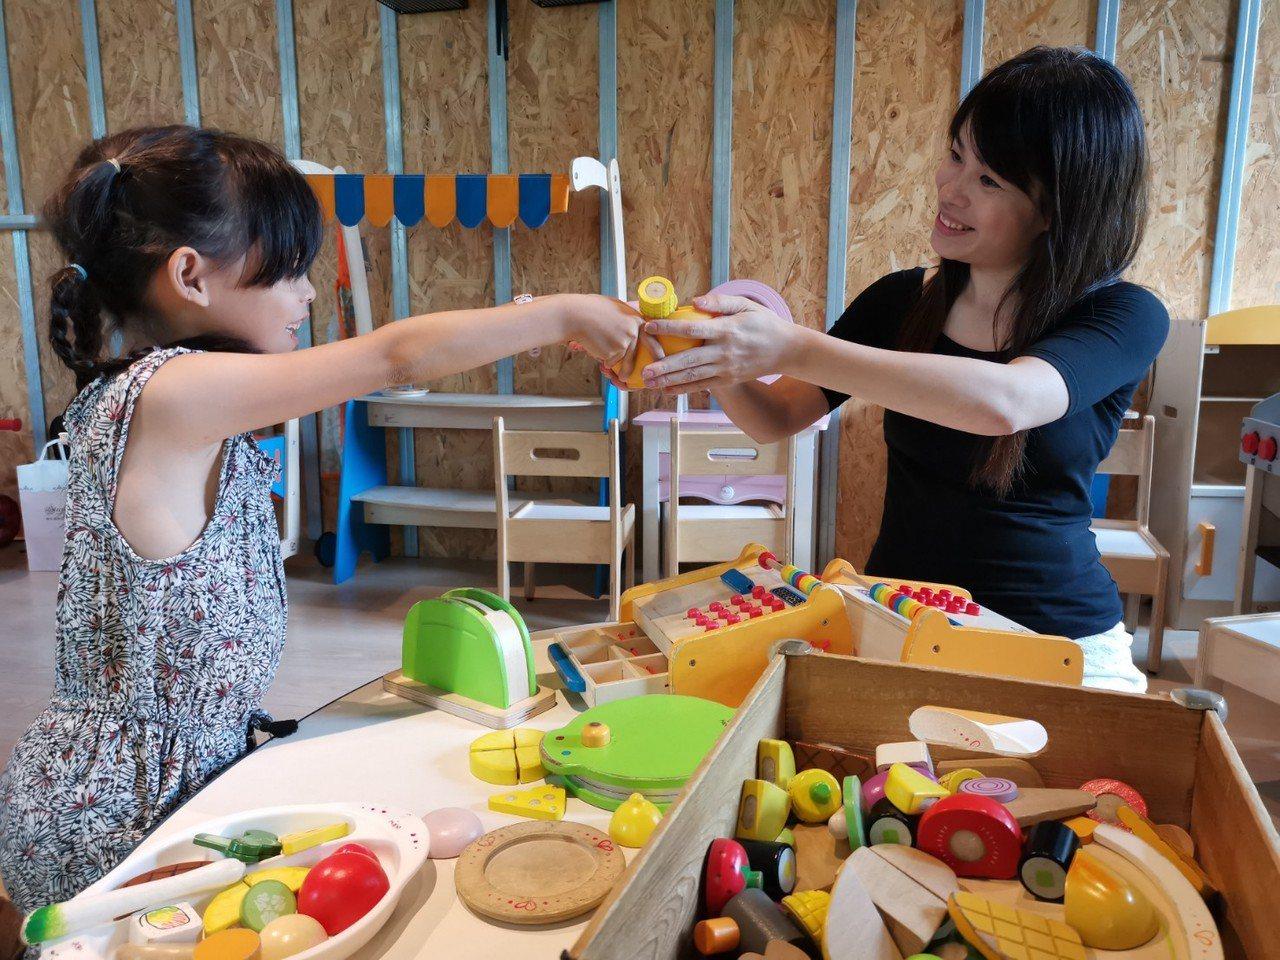 MONEYJUMP的積木是選用德國木頭玩具頂級品牌「Hape愛傑卡」,誠意十足。...